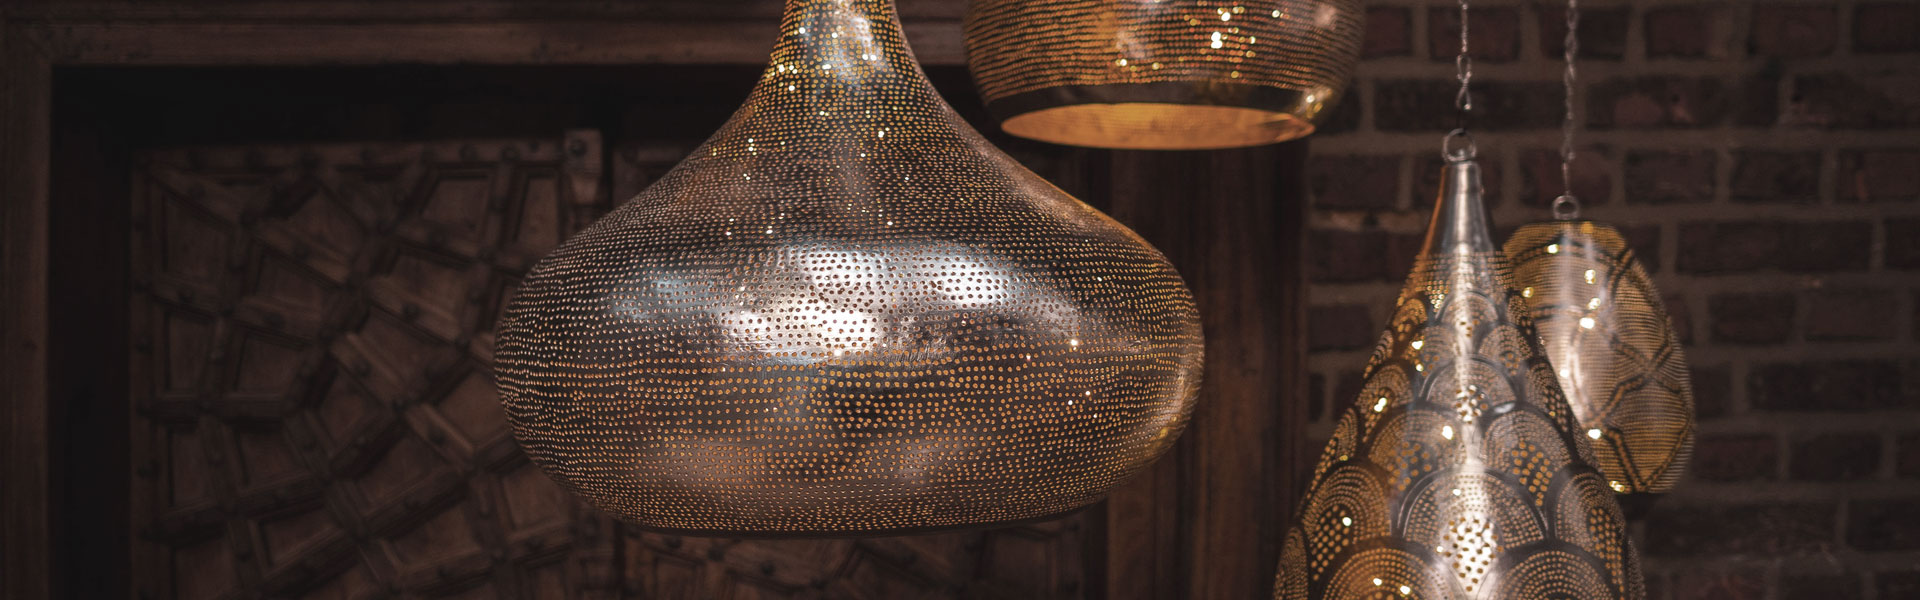 Orientalische Lampen & marokkanische Leuchten  Casa-Moro